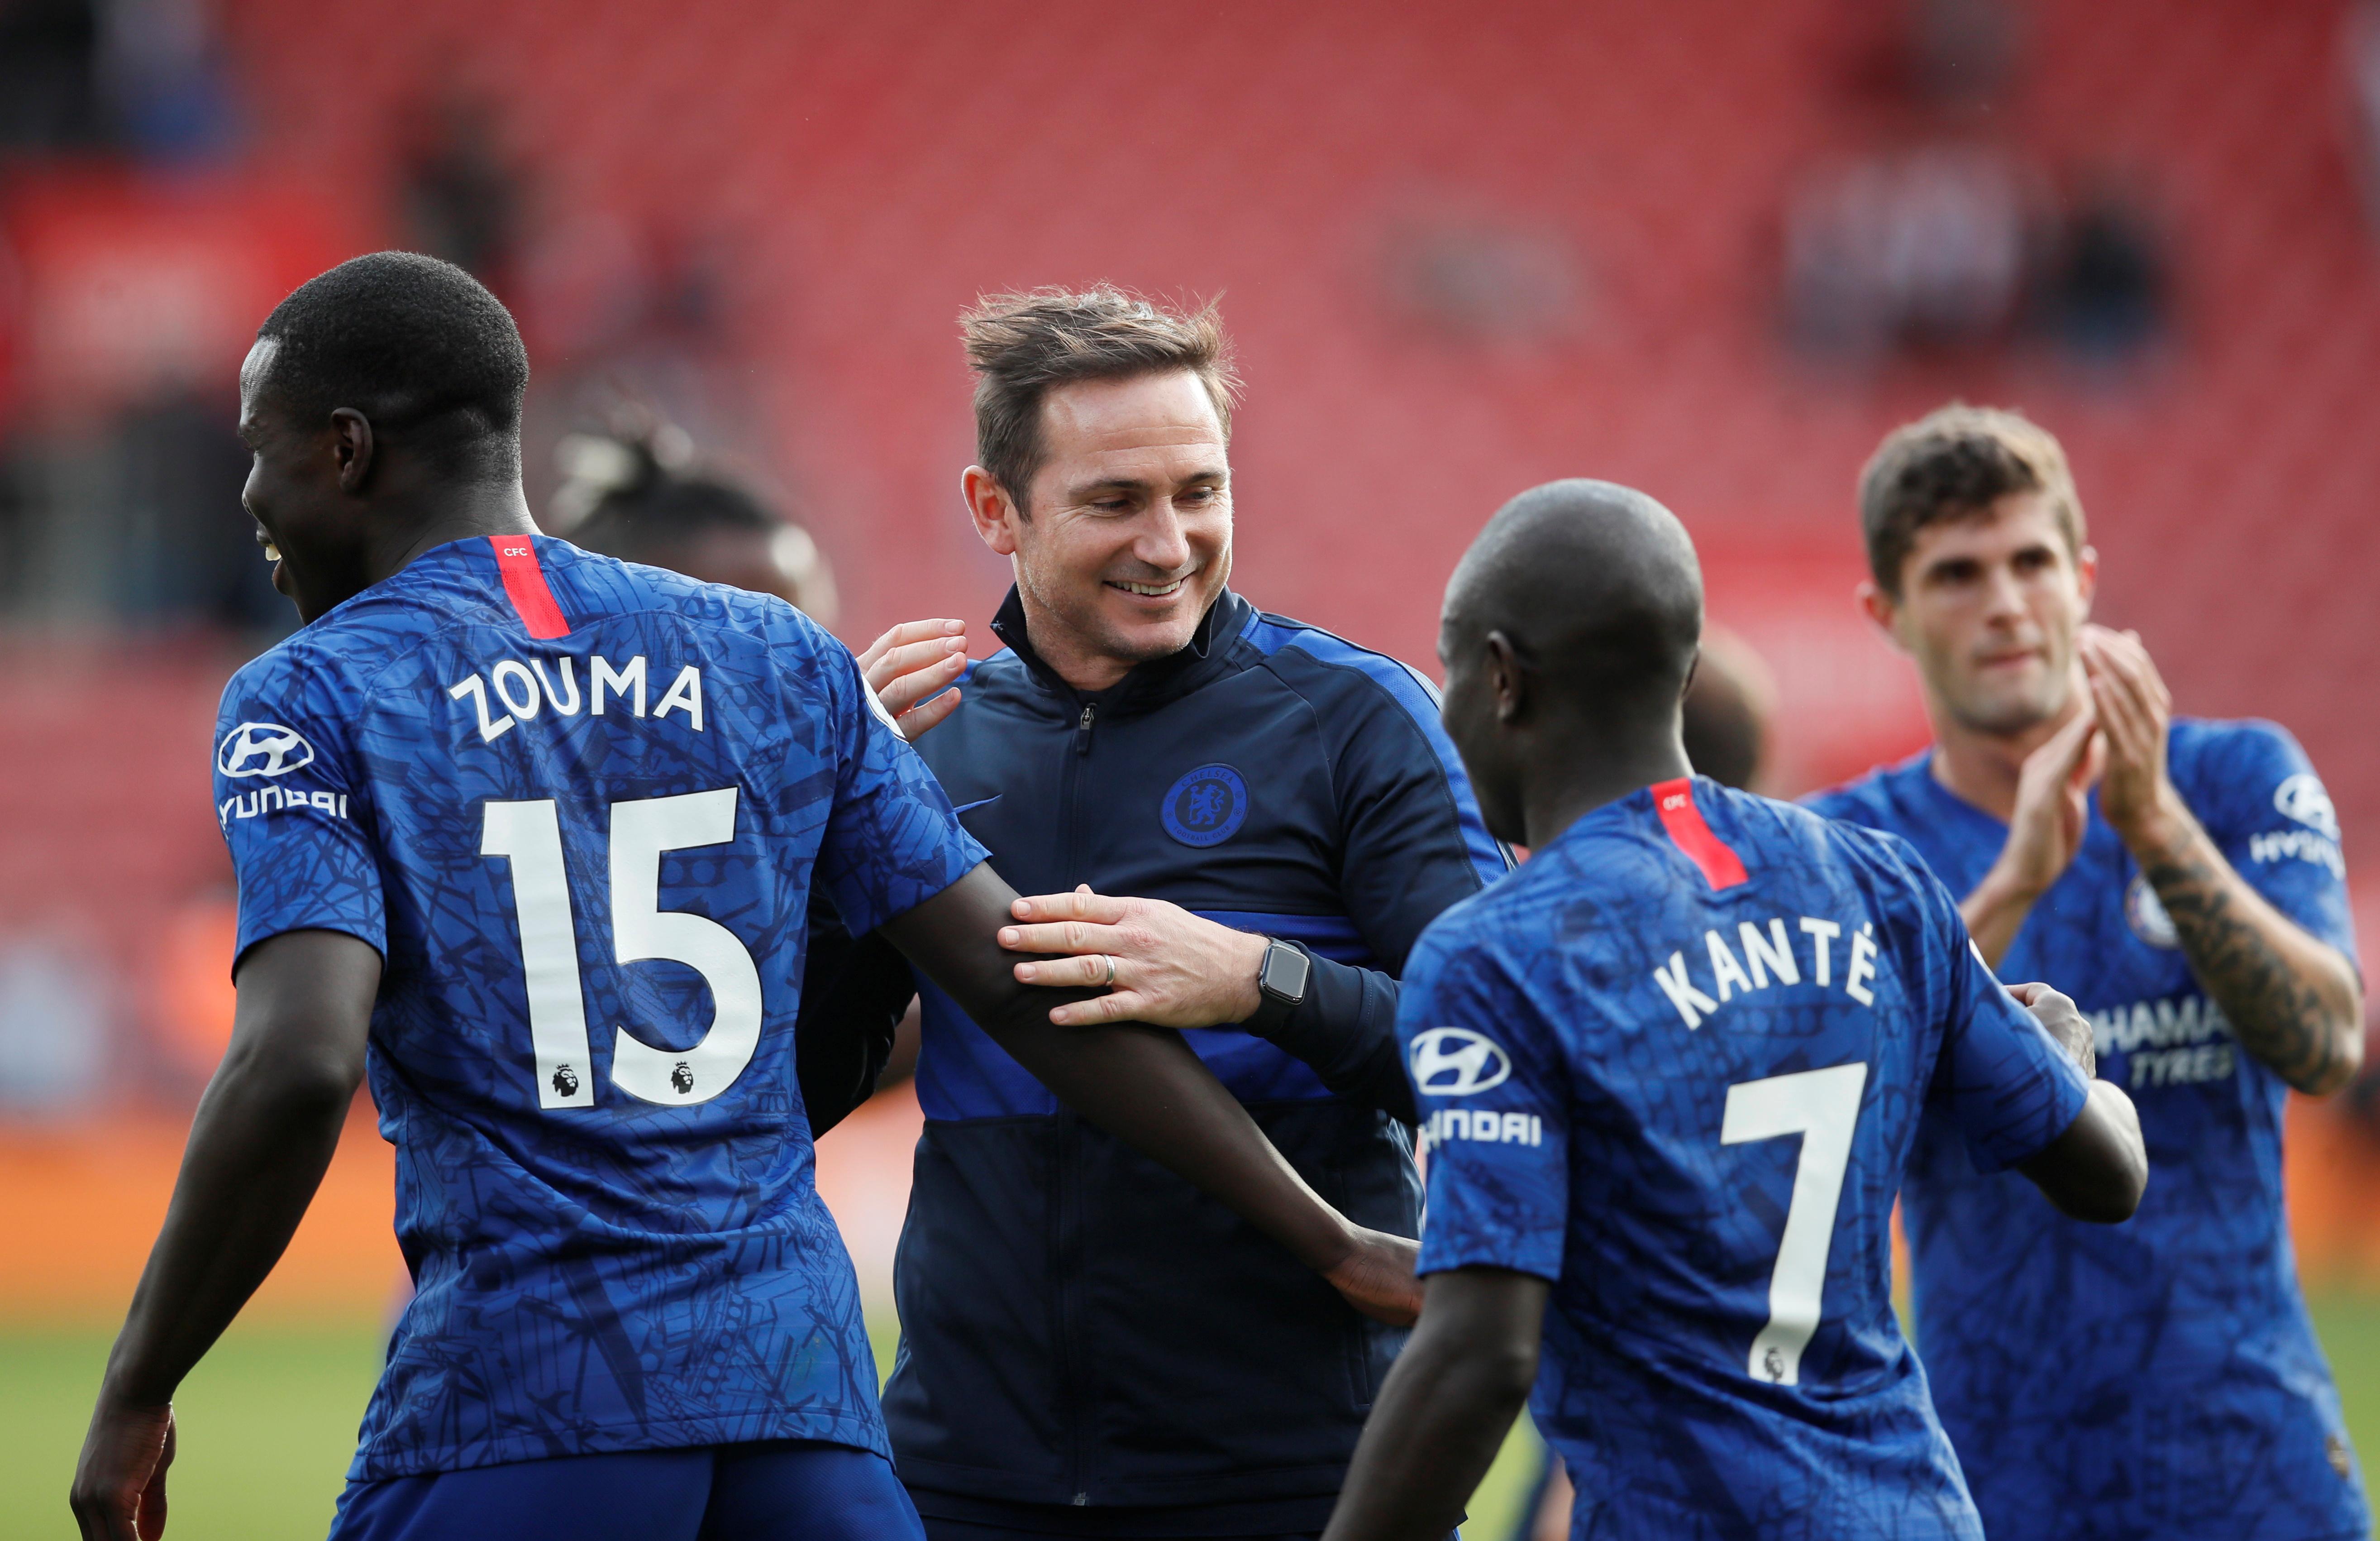 Chelsea boss Frank Lampard slams France for N'Golo Kante injury